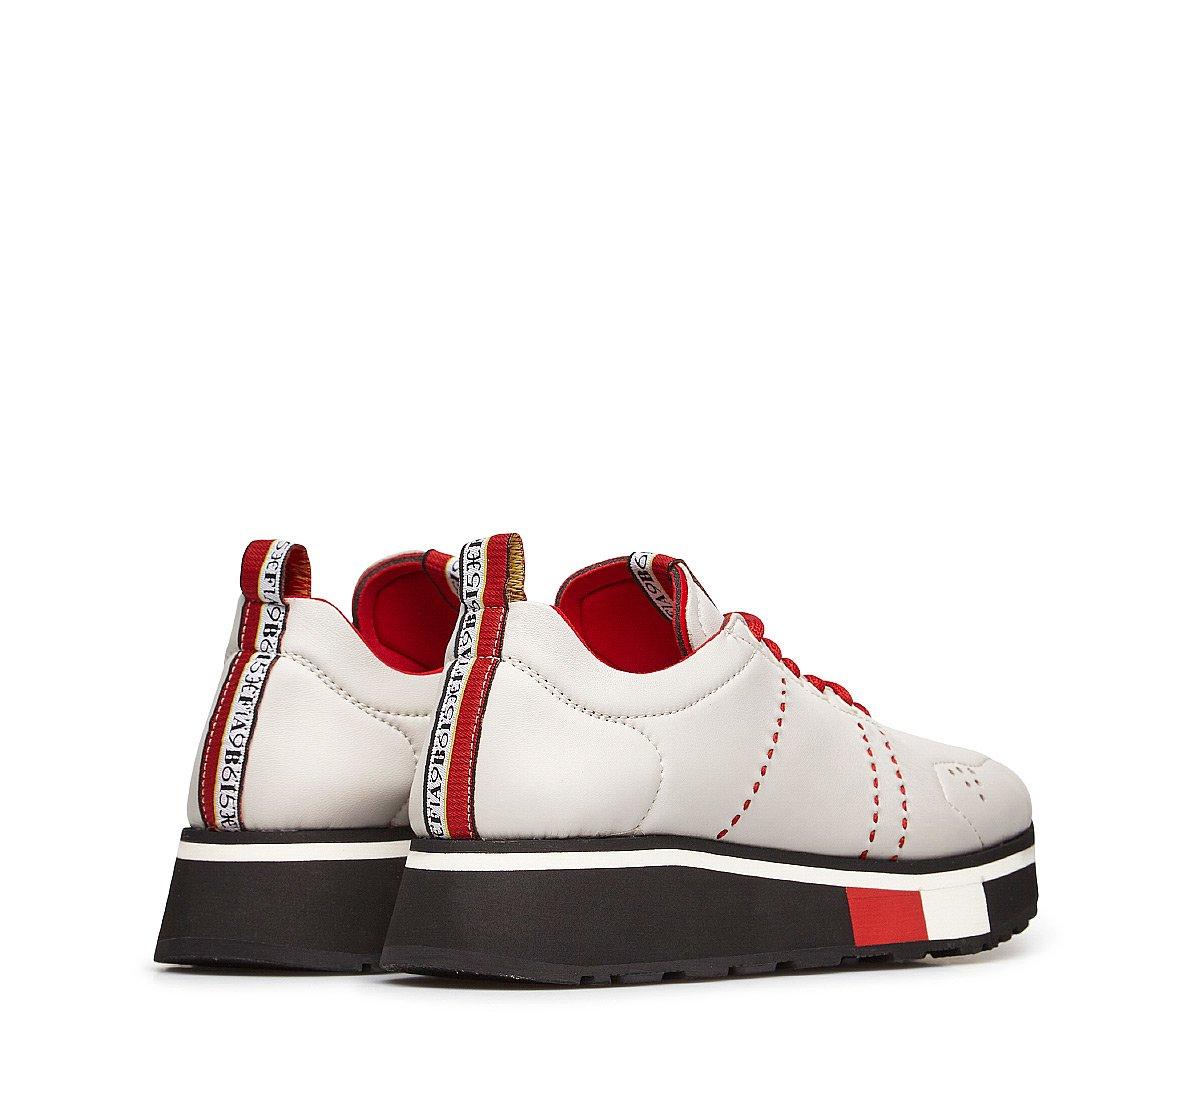 NewFabi F65 sneakers